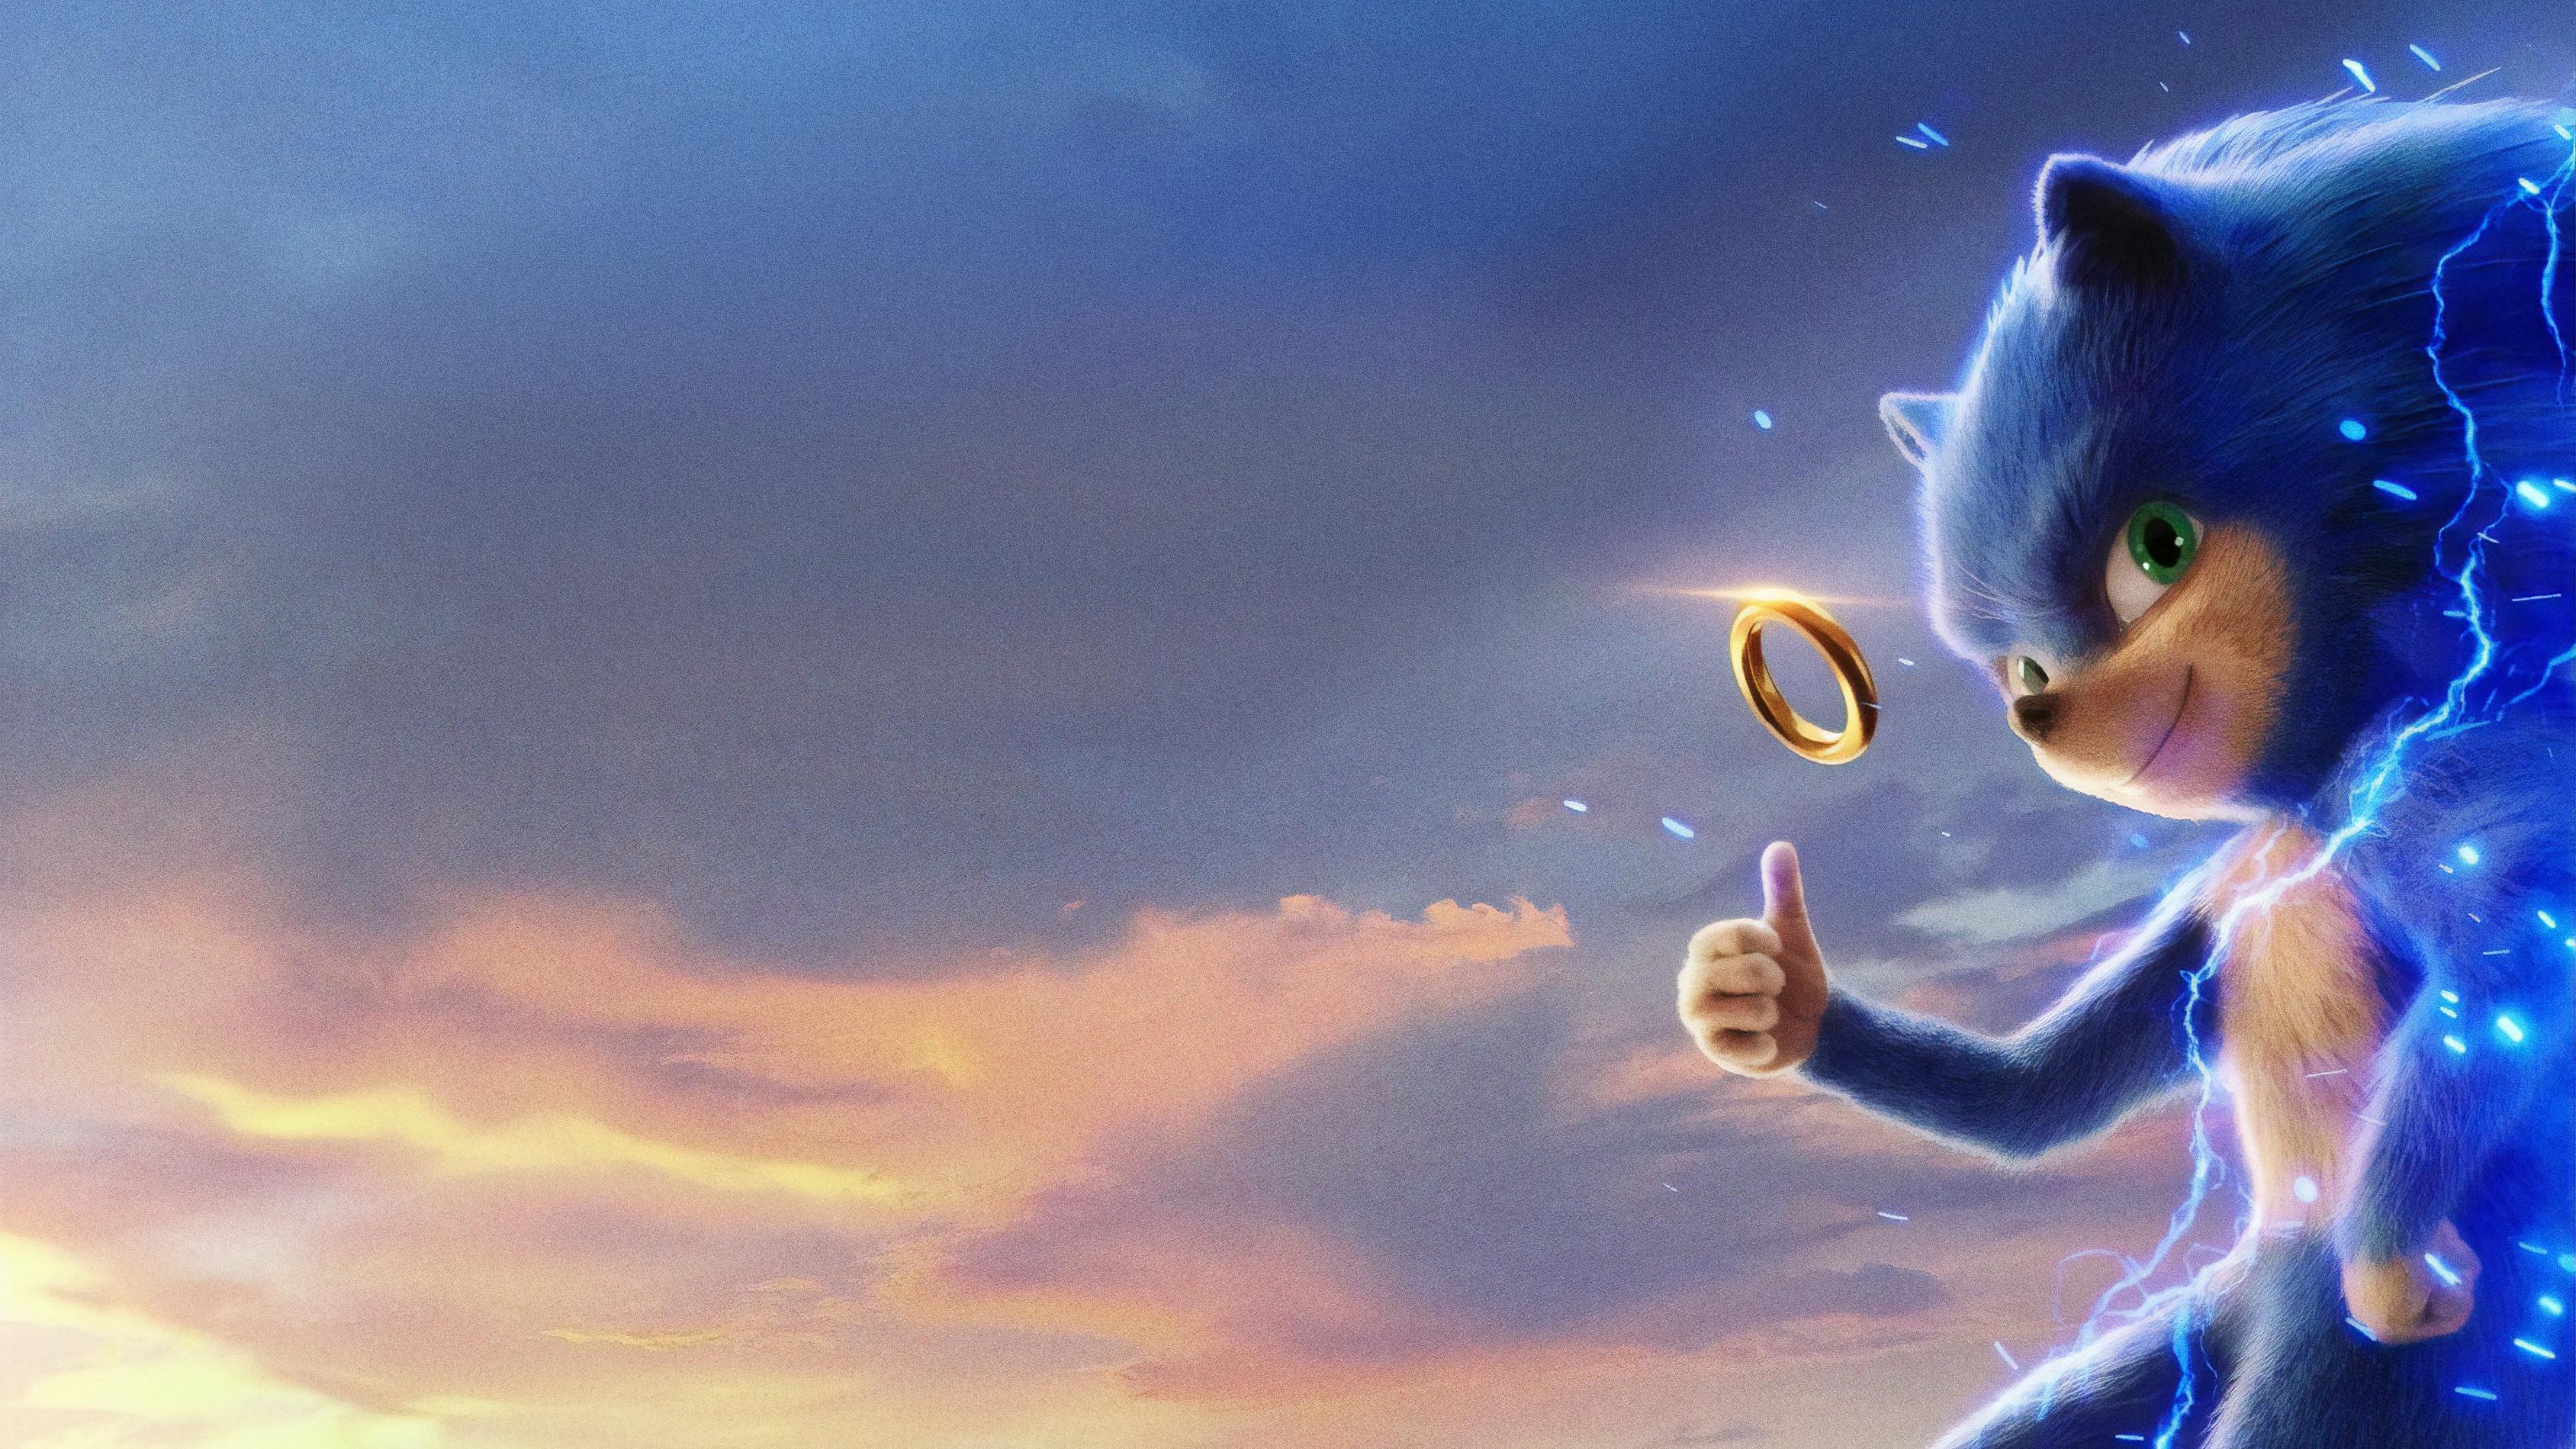 Sonic The Hedgehog 2019 Movie 4k Hd Movies 4k Wallpapers